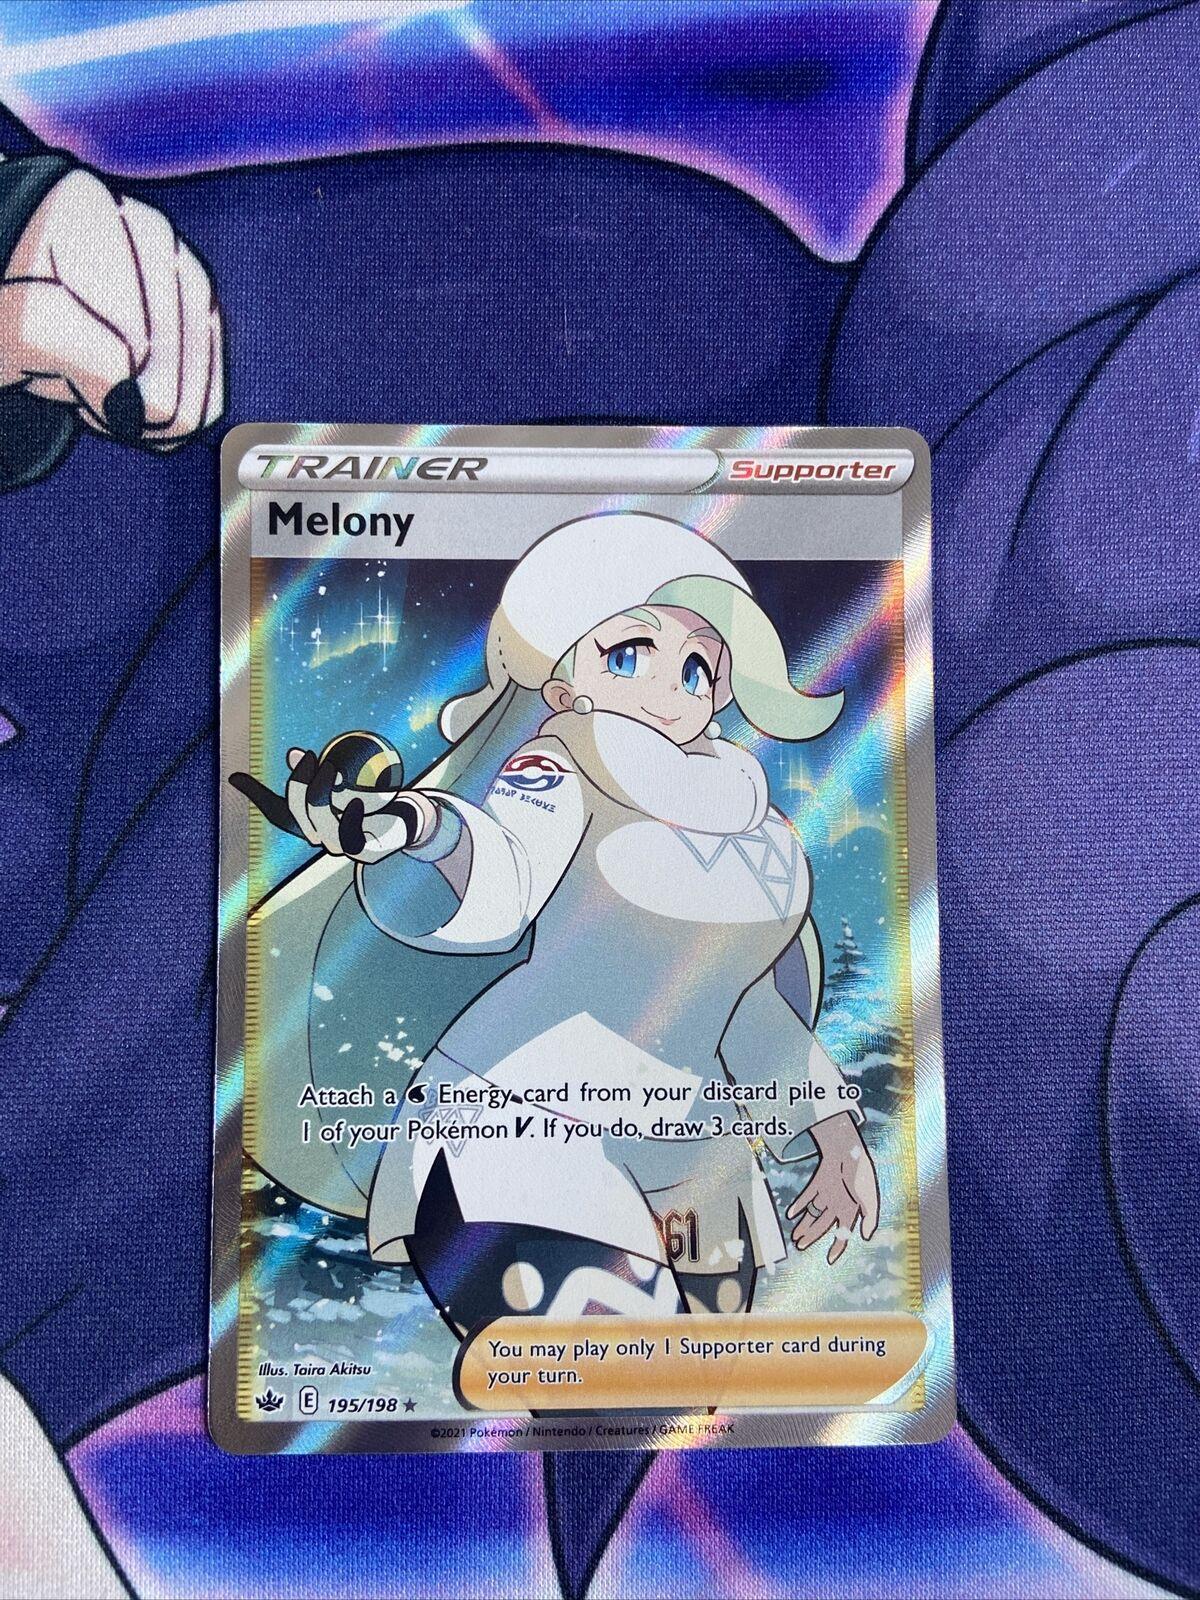 Melony 195/198 Chilling Reign Full Art Trainer Ultra Rare Holo Pokemon Card Mint